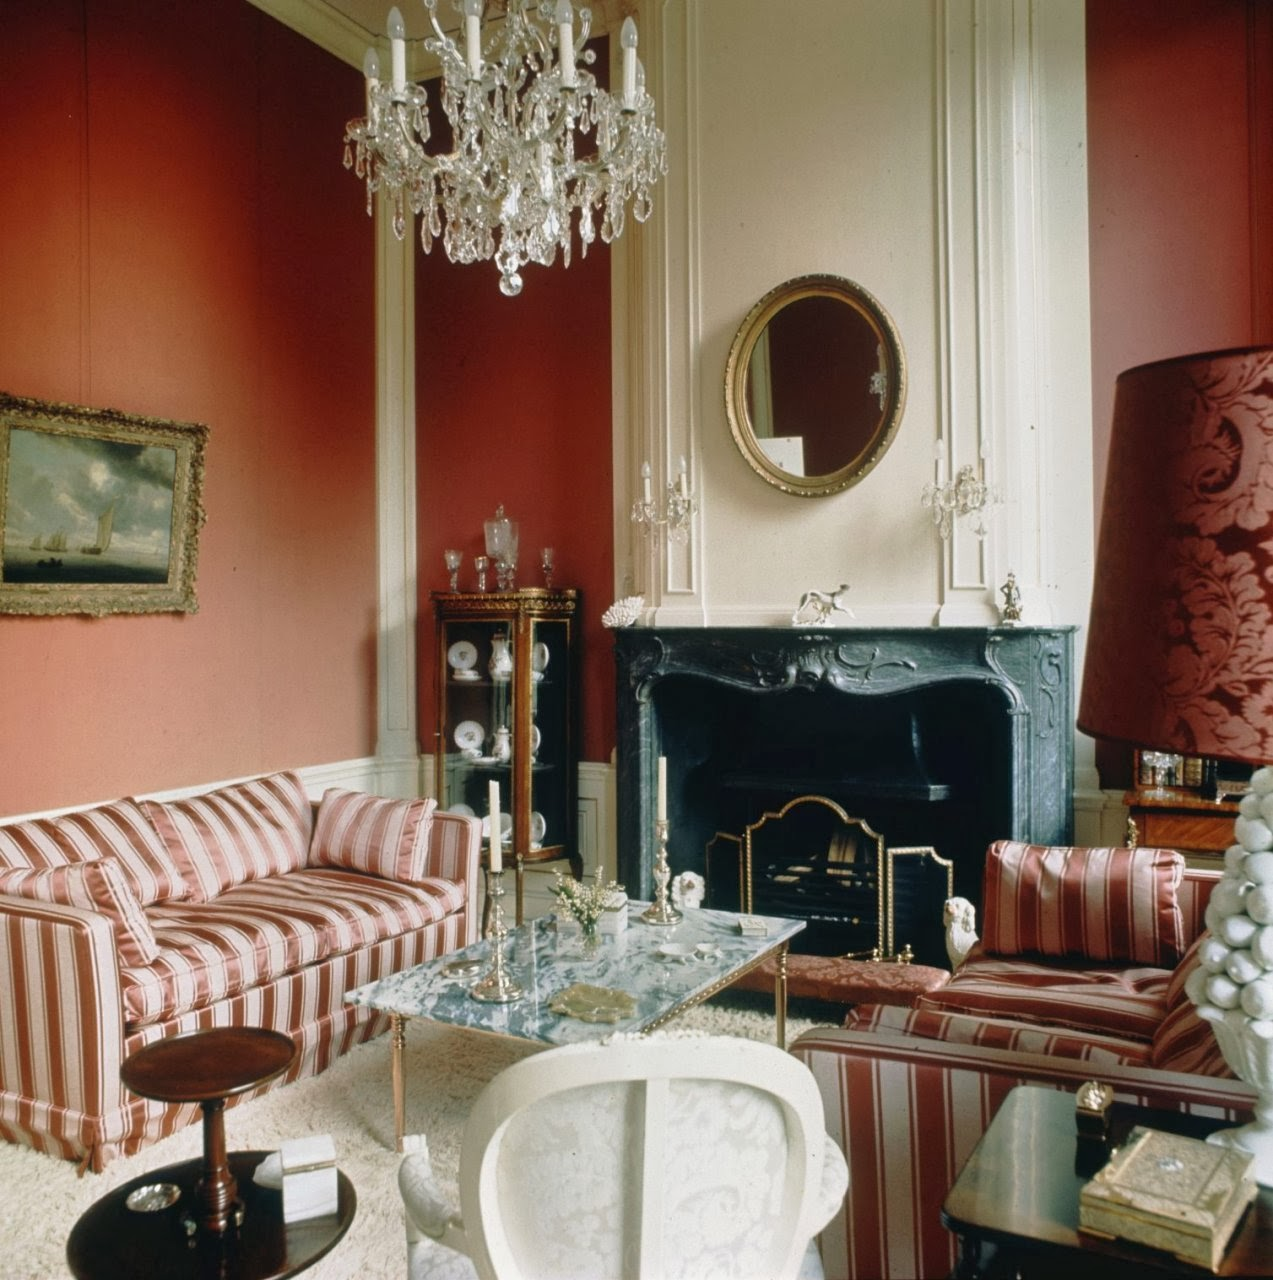 The Dutch Royal Family: Koninklijke huizen: Kasteel Drakensteyn